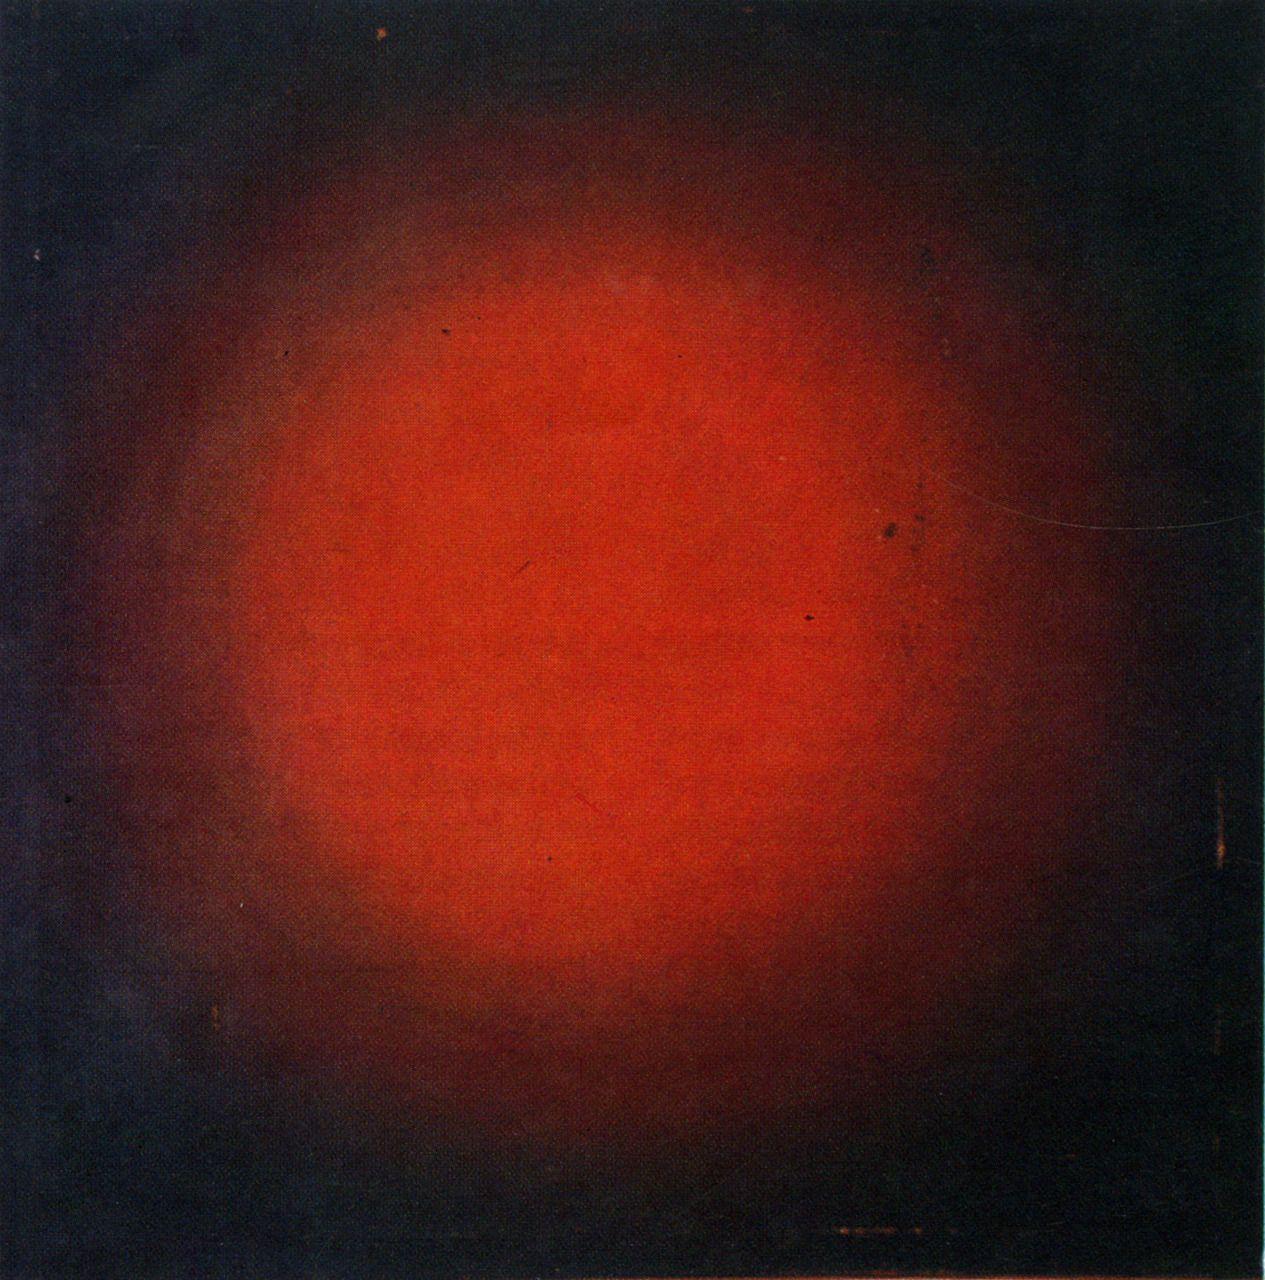 IVAN  KLIUN RED LIGHT MINIMALISM  ART GICLEE PRINT FINE CANVAS